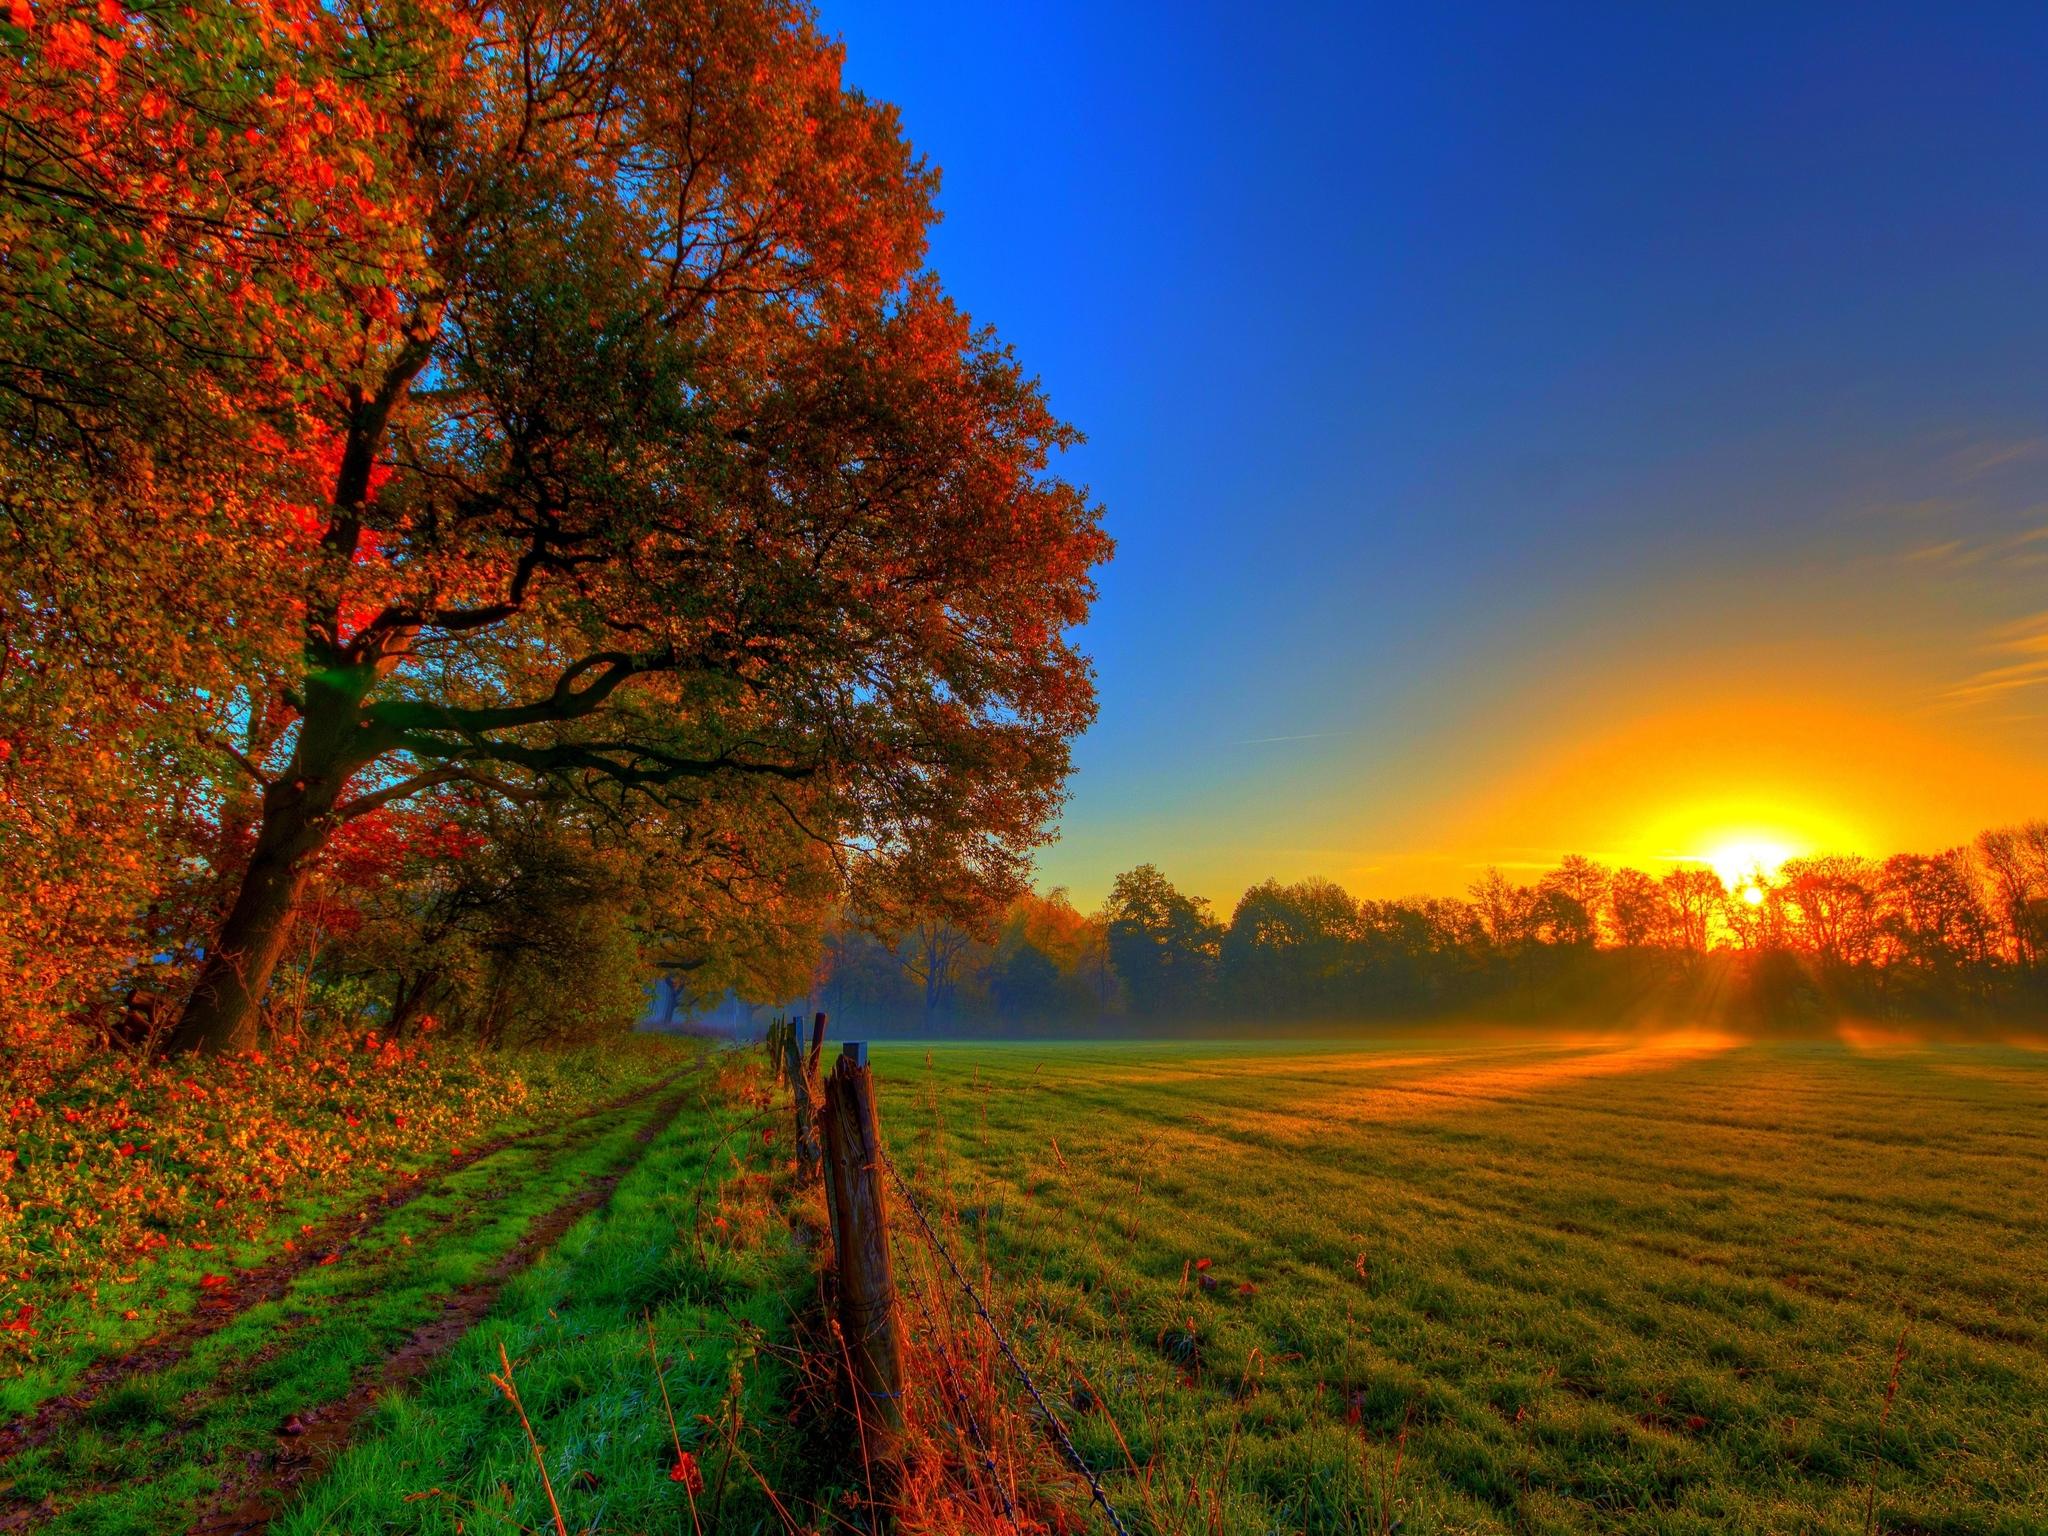 Autumn field 4K Ultra HD wallpaper 4k WallpaperNet 2048x1536